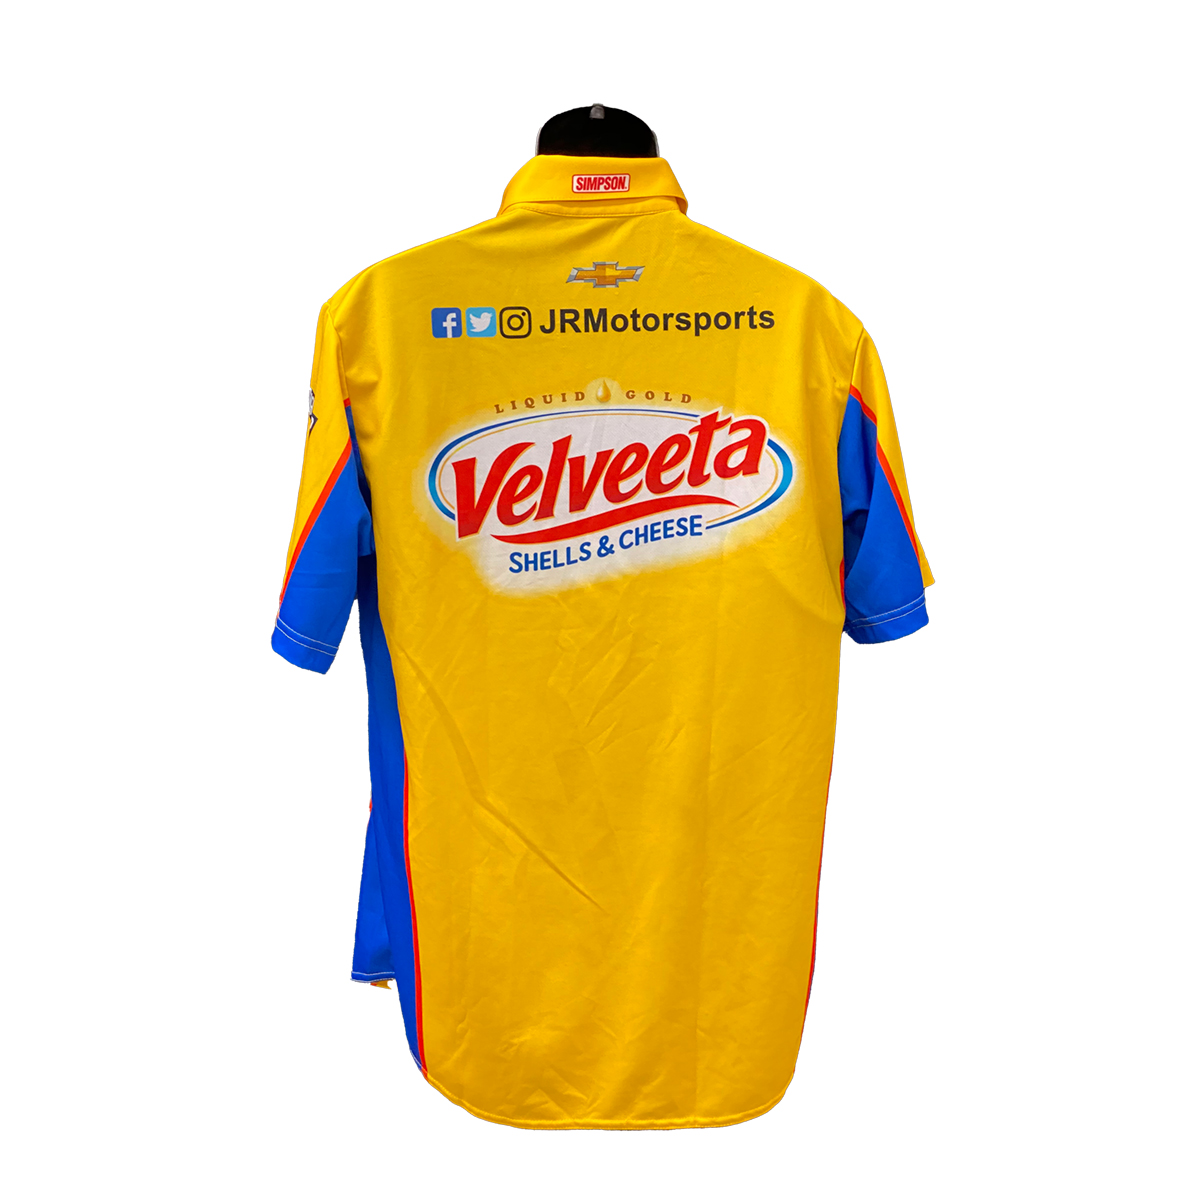 JRM Crew Shirt 2019 RACE USED - Velveeta #8